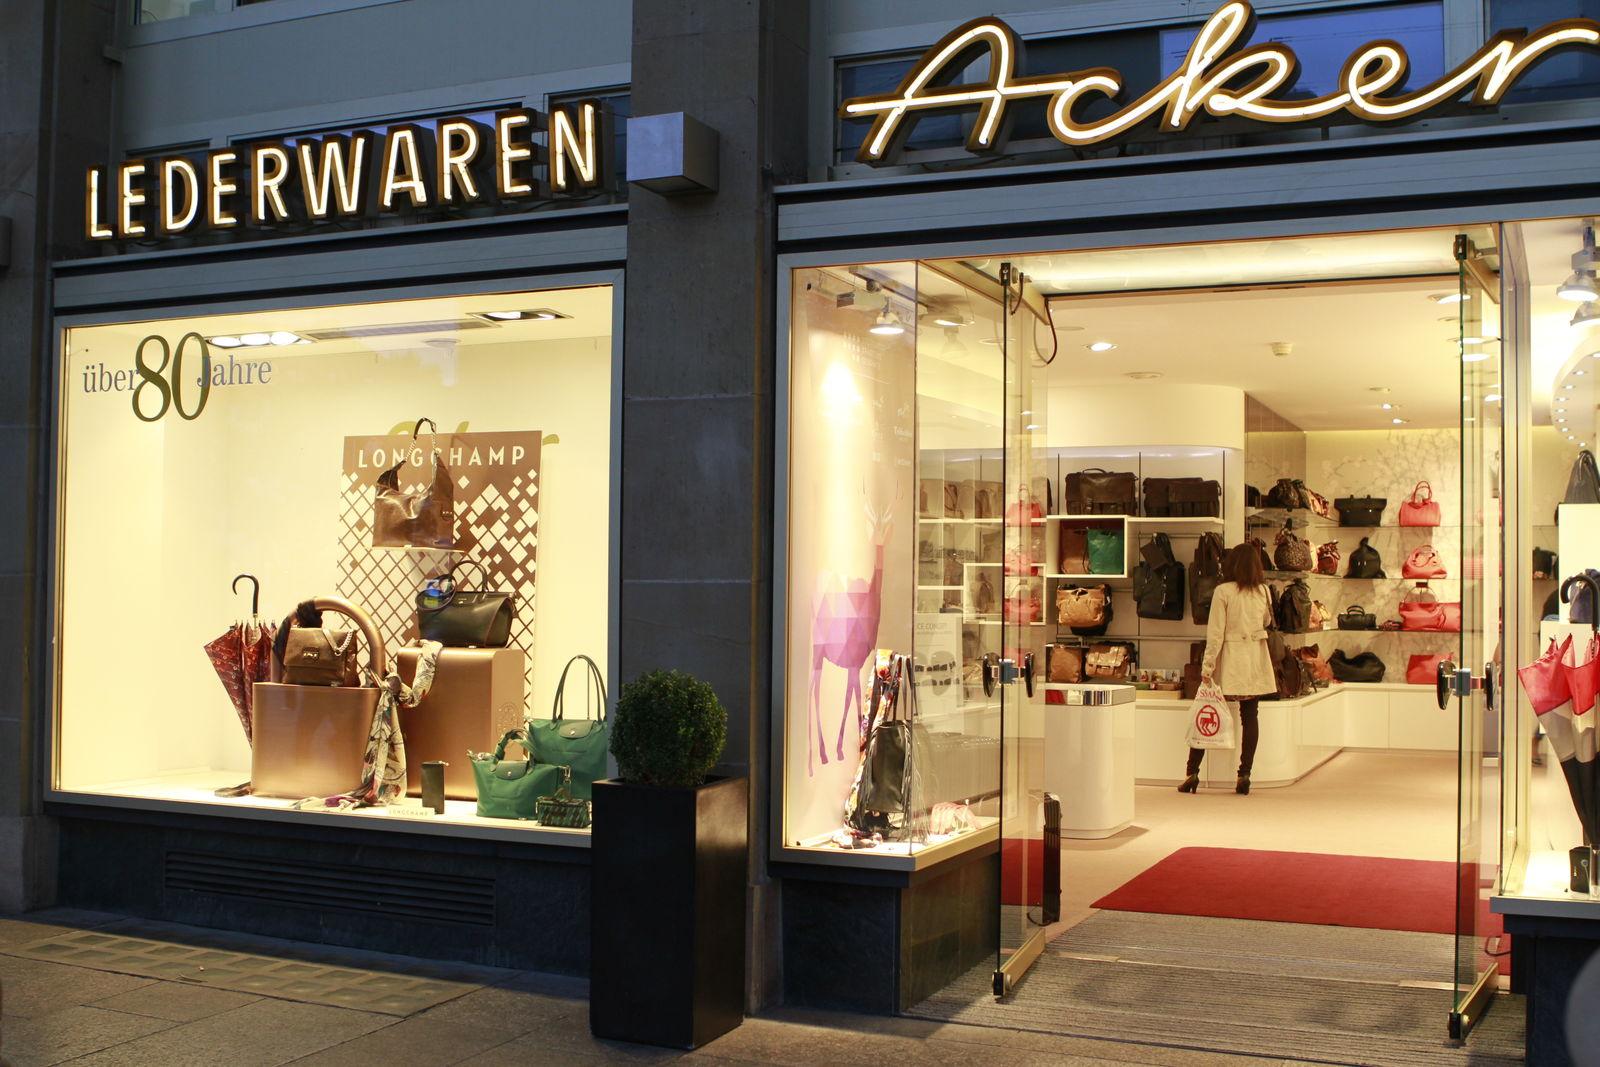 Lederwaren Acker in Stuttgart (Bild 3)